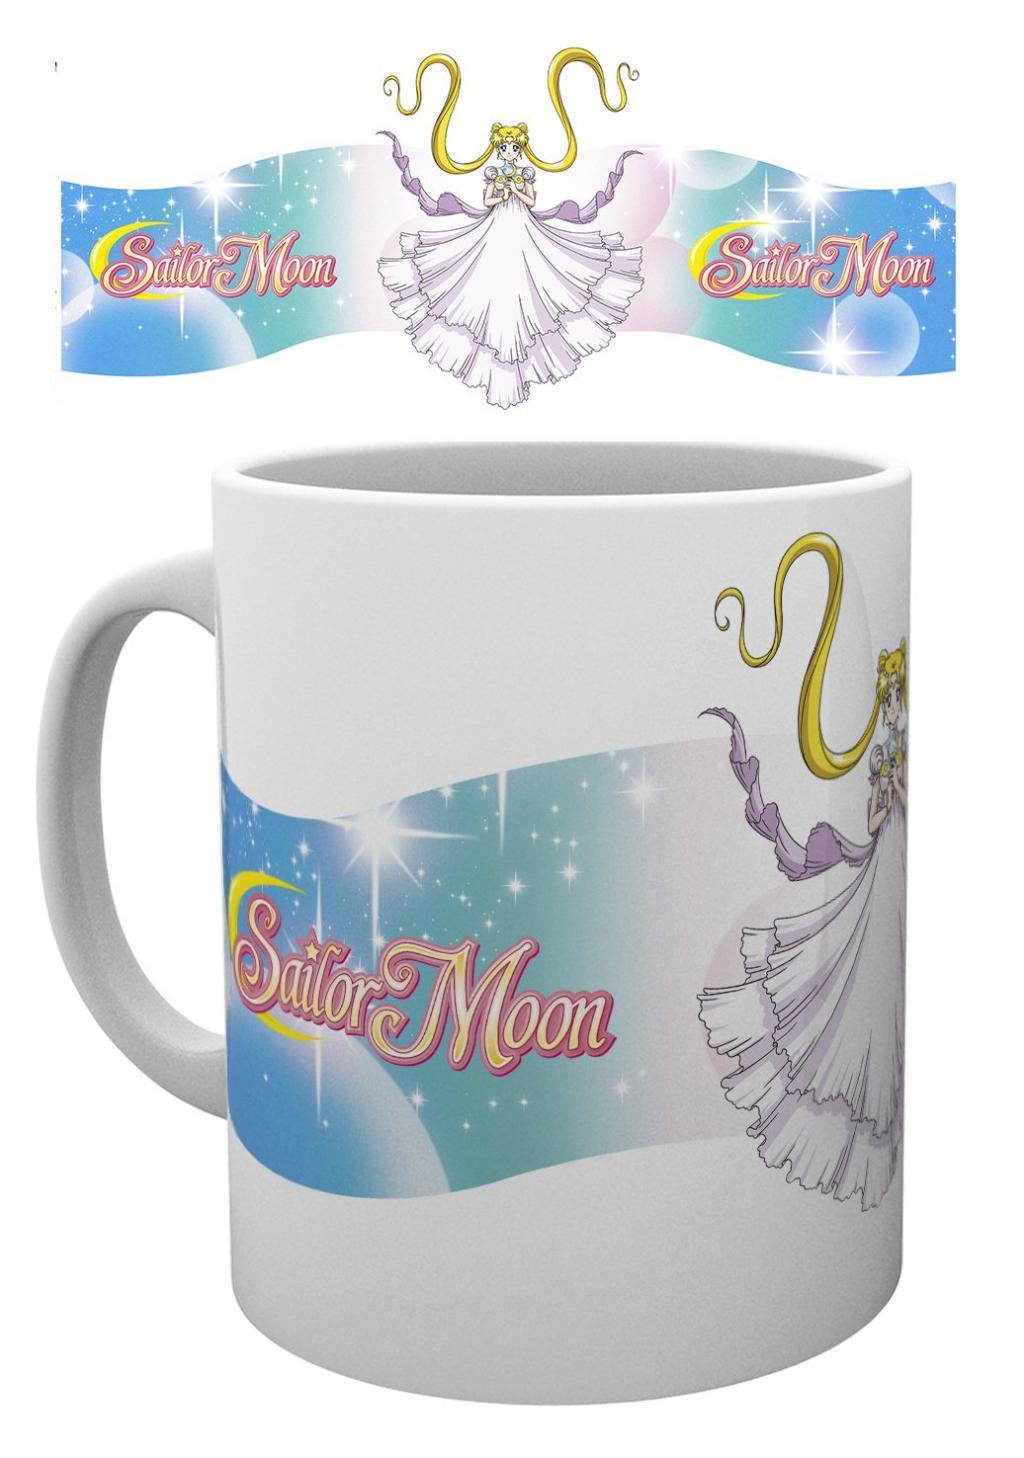 SAILOR MOON - Mug - 315 ml - Serenity